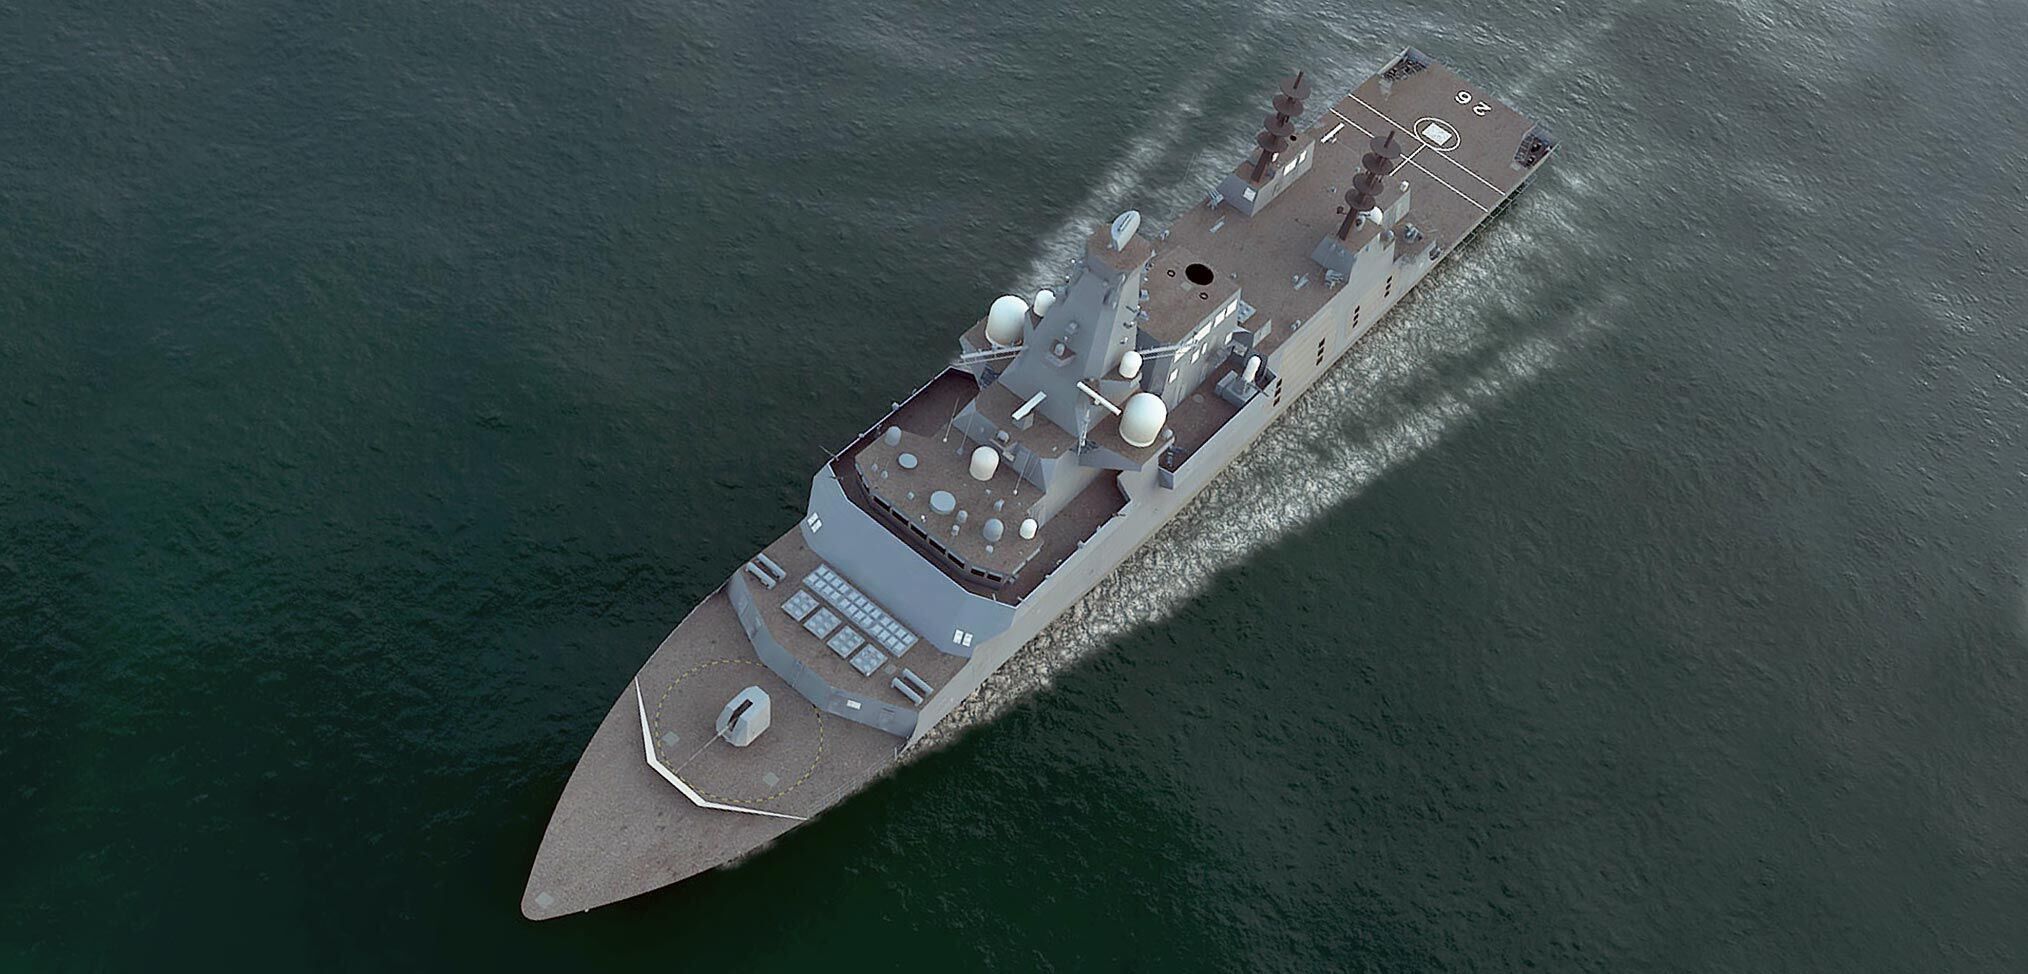 Under-gunned Royal Navy warships?